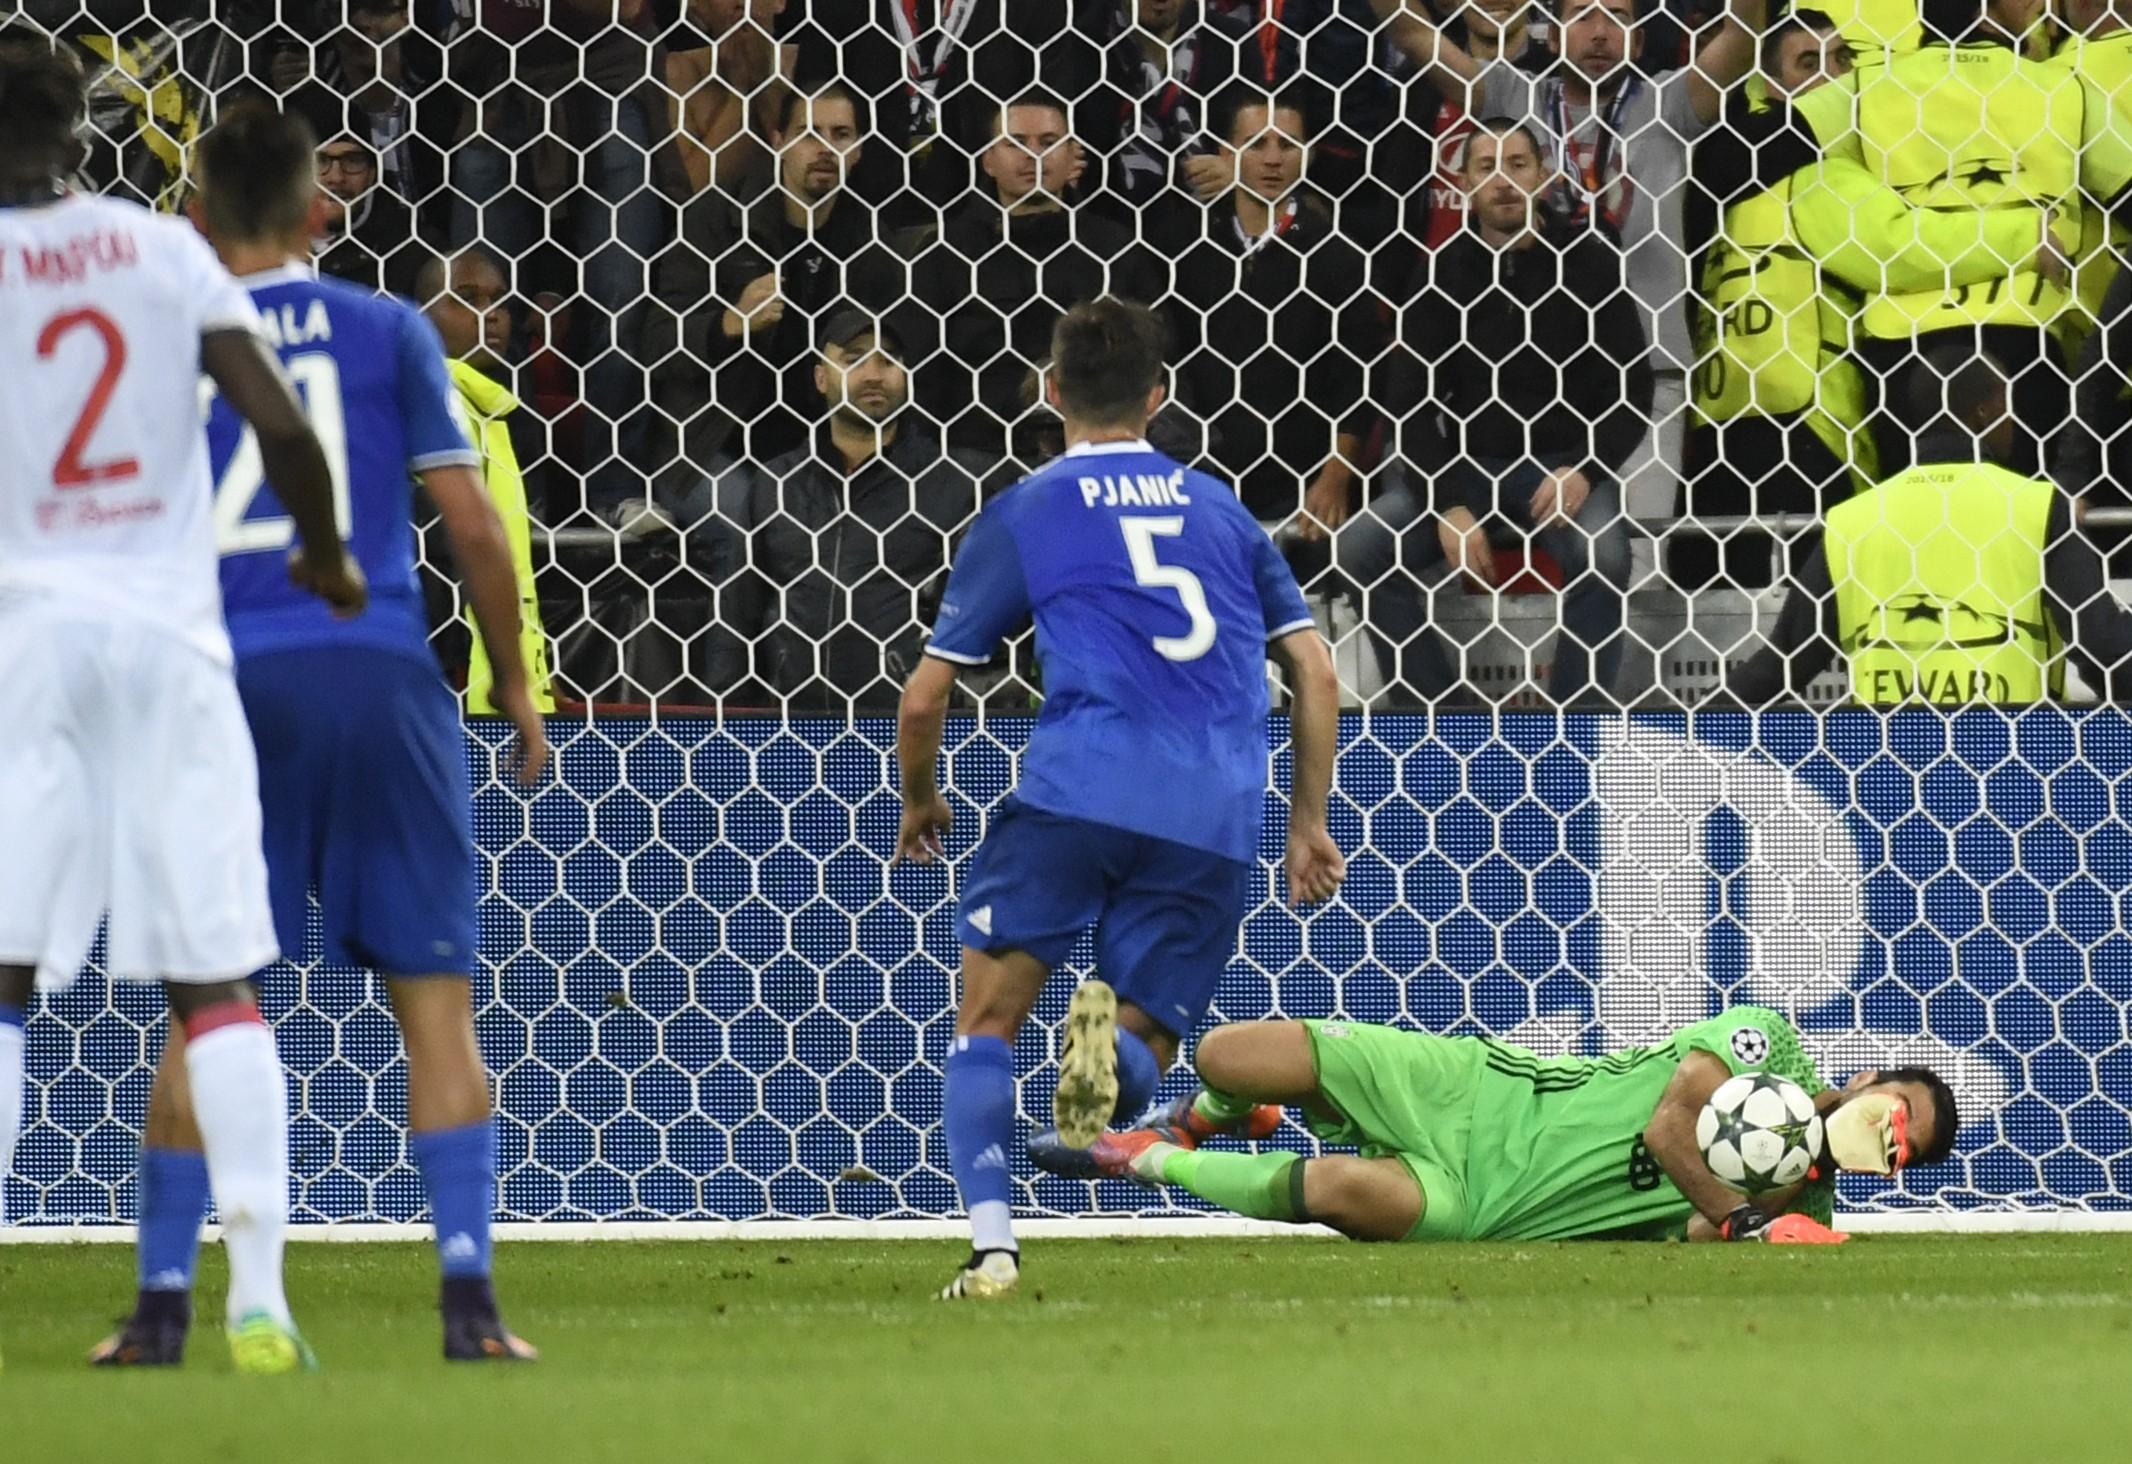 Gigi Buffon saves from Lacazette